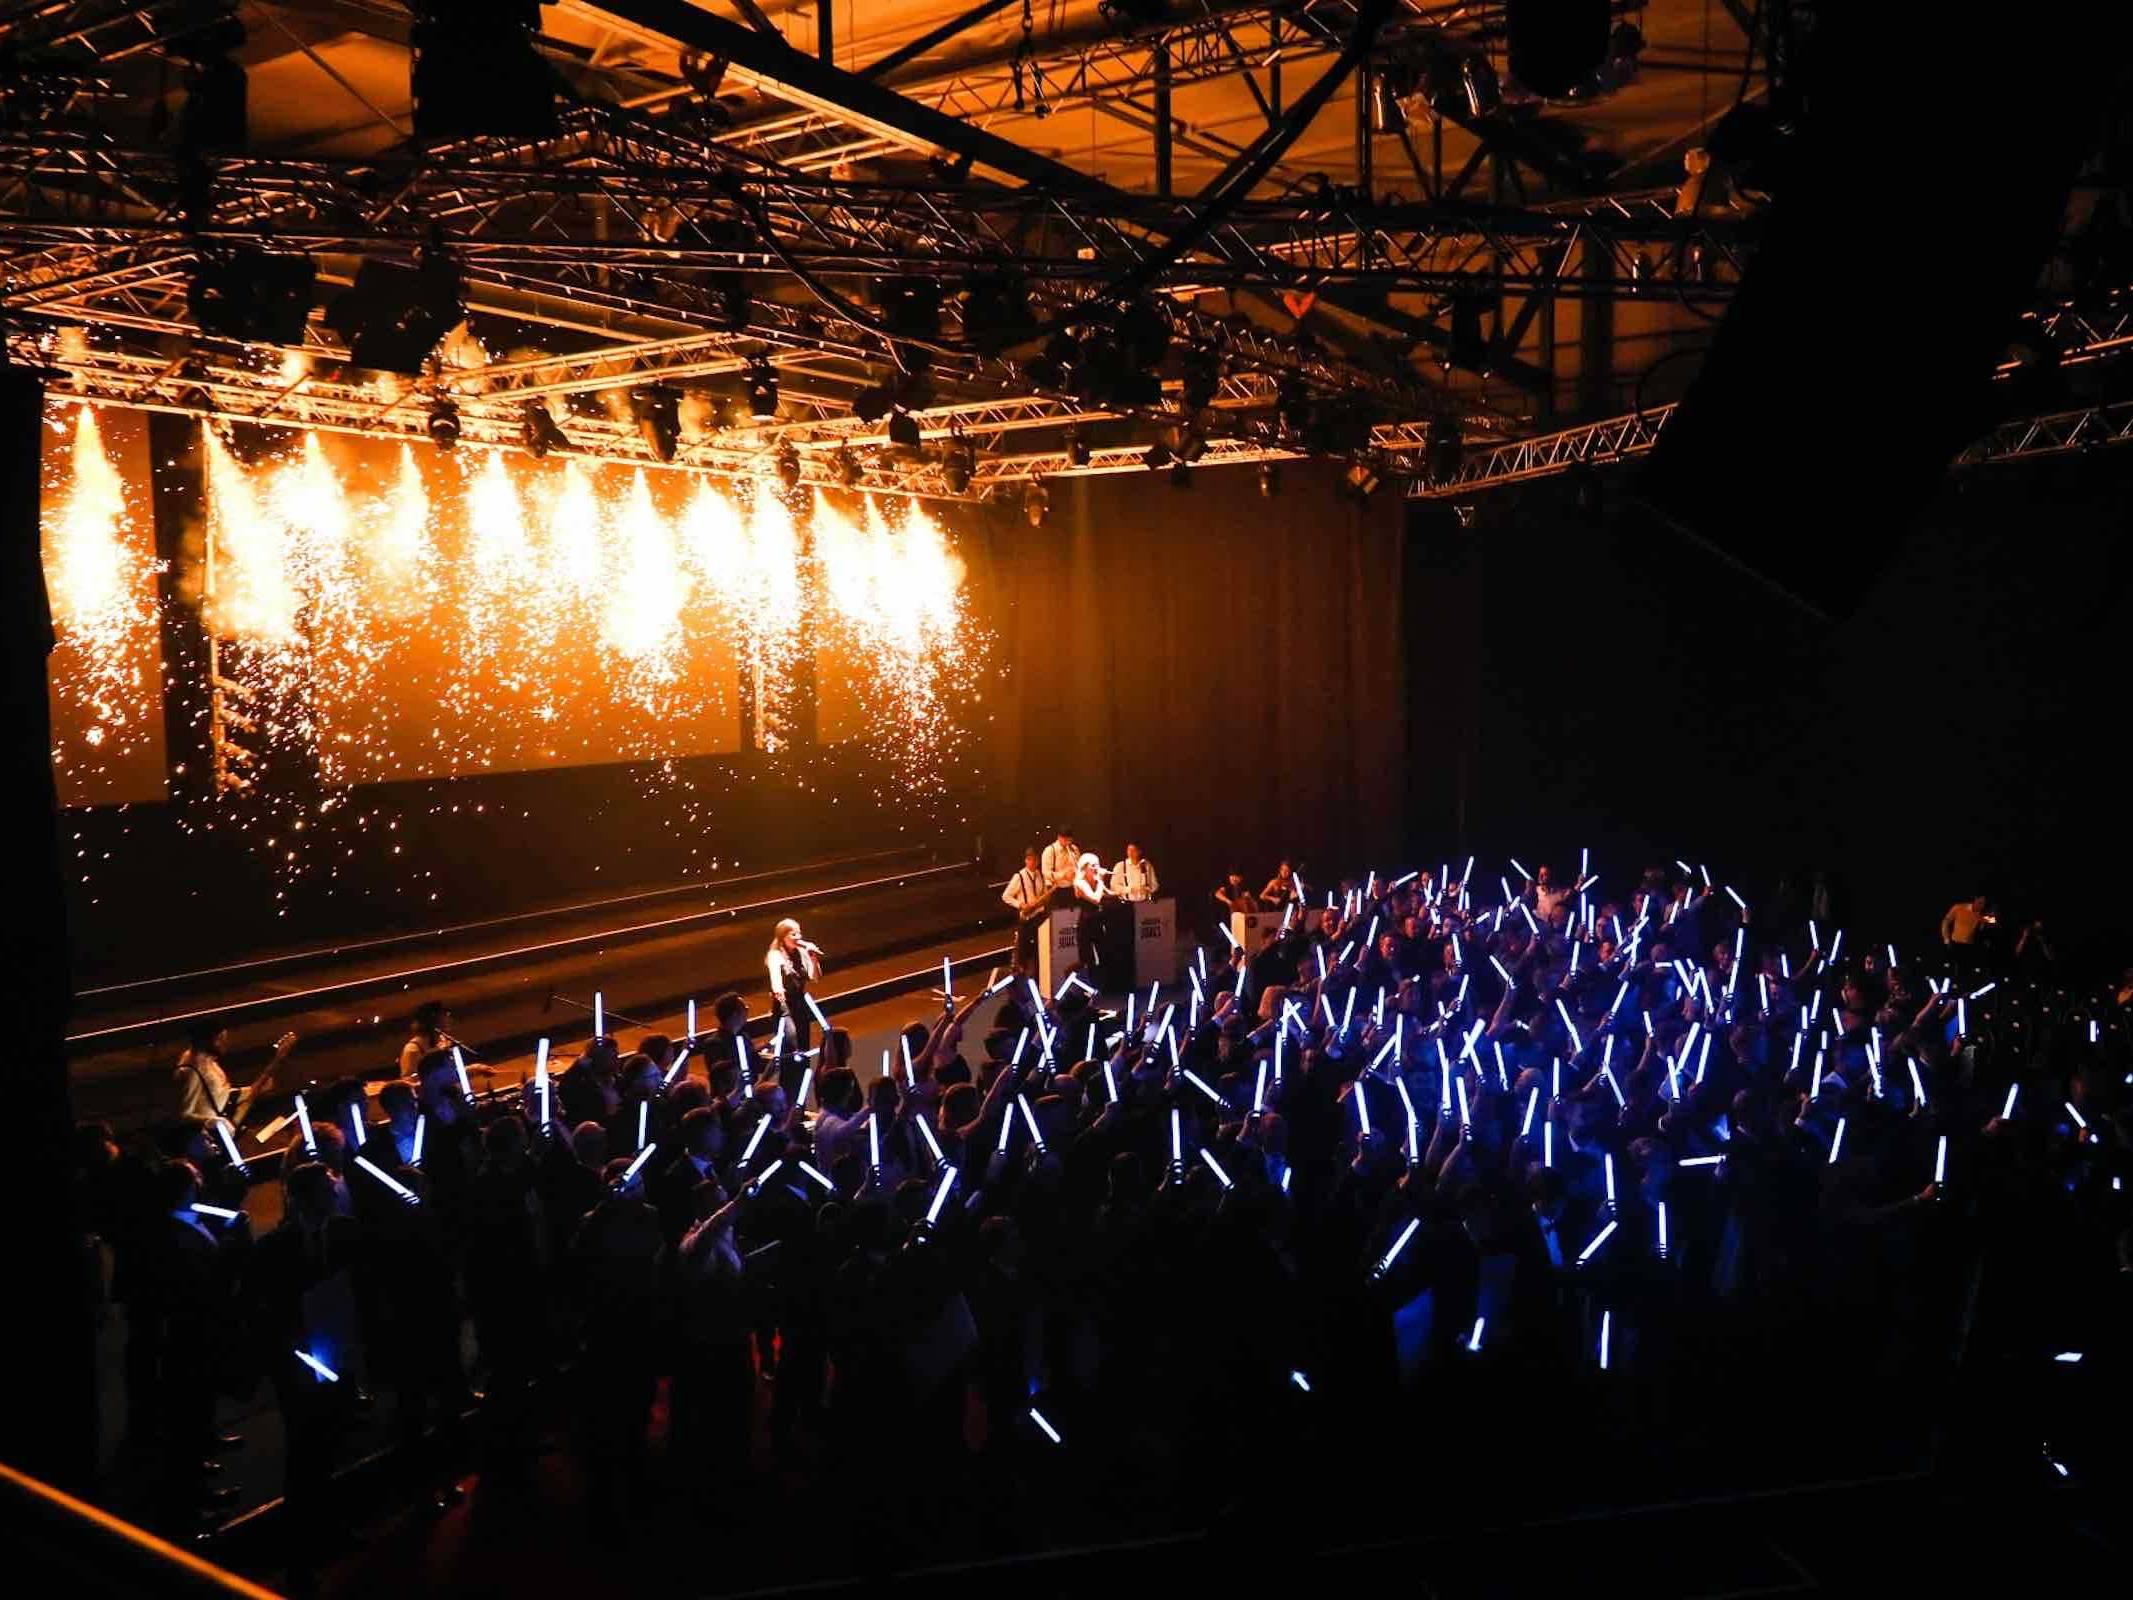 Band | Hamburg | Jazz | Swing | Motown | Pop | Lounge | Partyband | Liveband | Messe | Gala | Hochzeit | Trauung | Empfang | Buchen | Mieten | Anfragen | Modern | Jukes | Hamburgfeiert